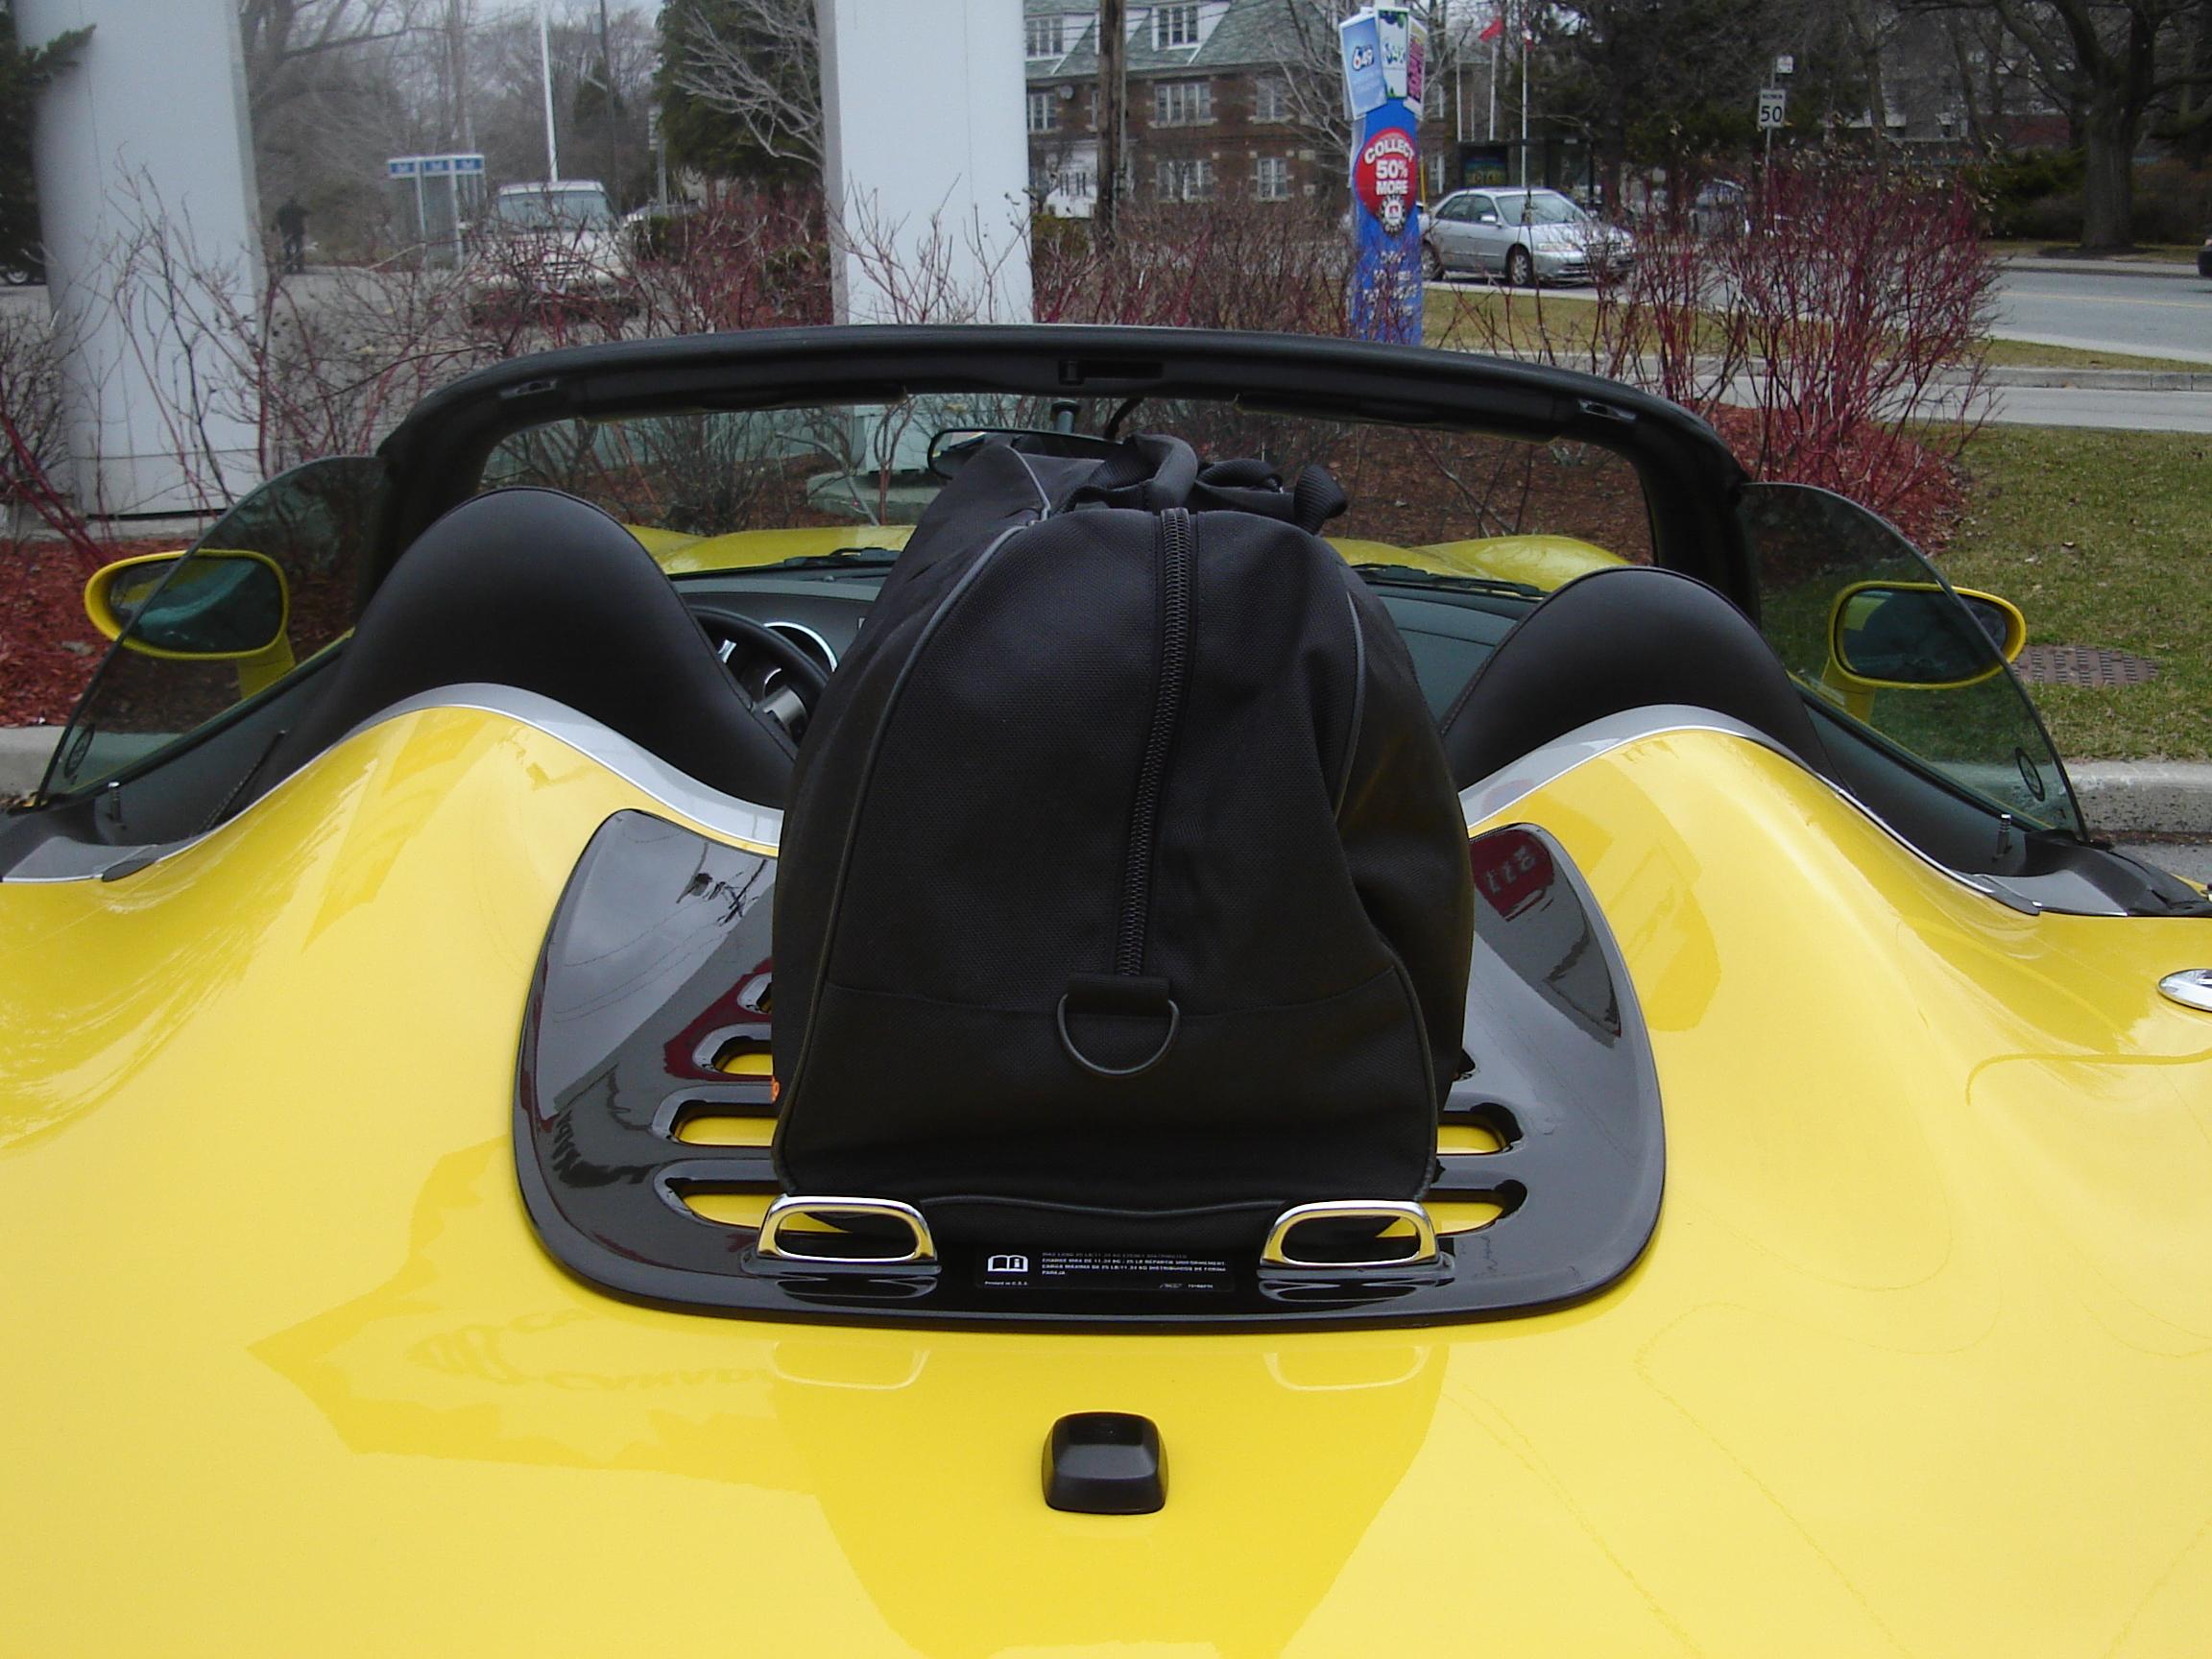 Gm Luggage Rack Installed Pontiac Solstice Forum